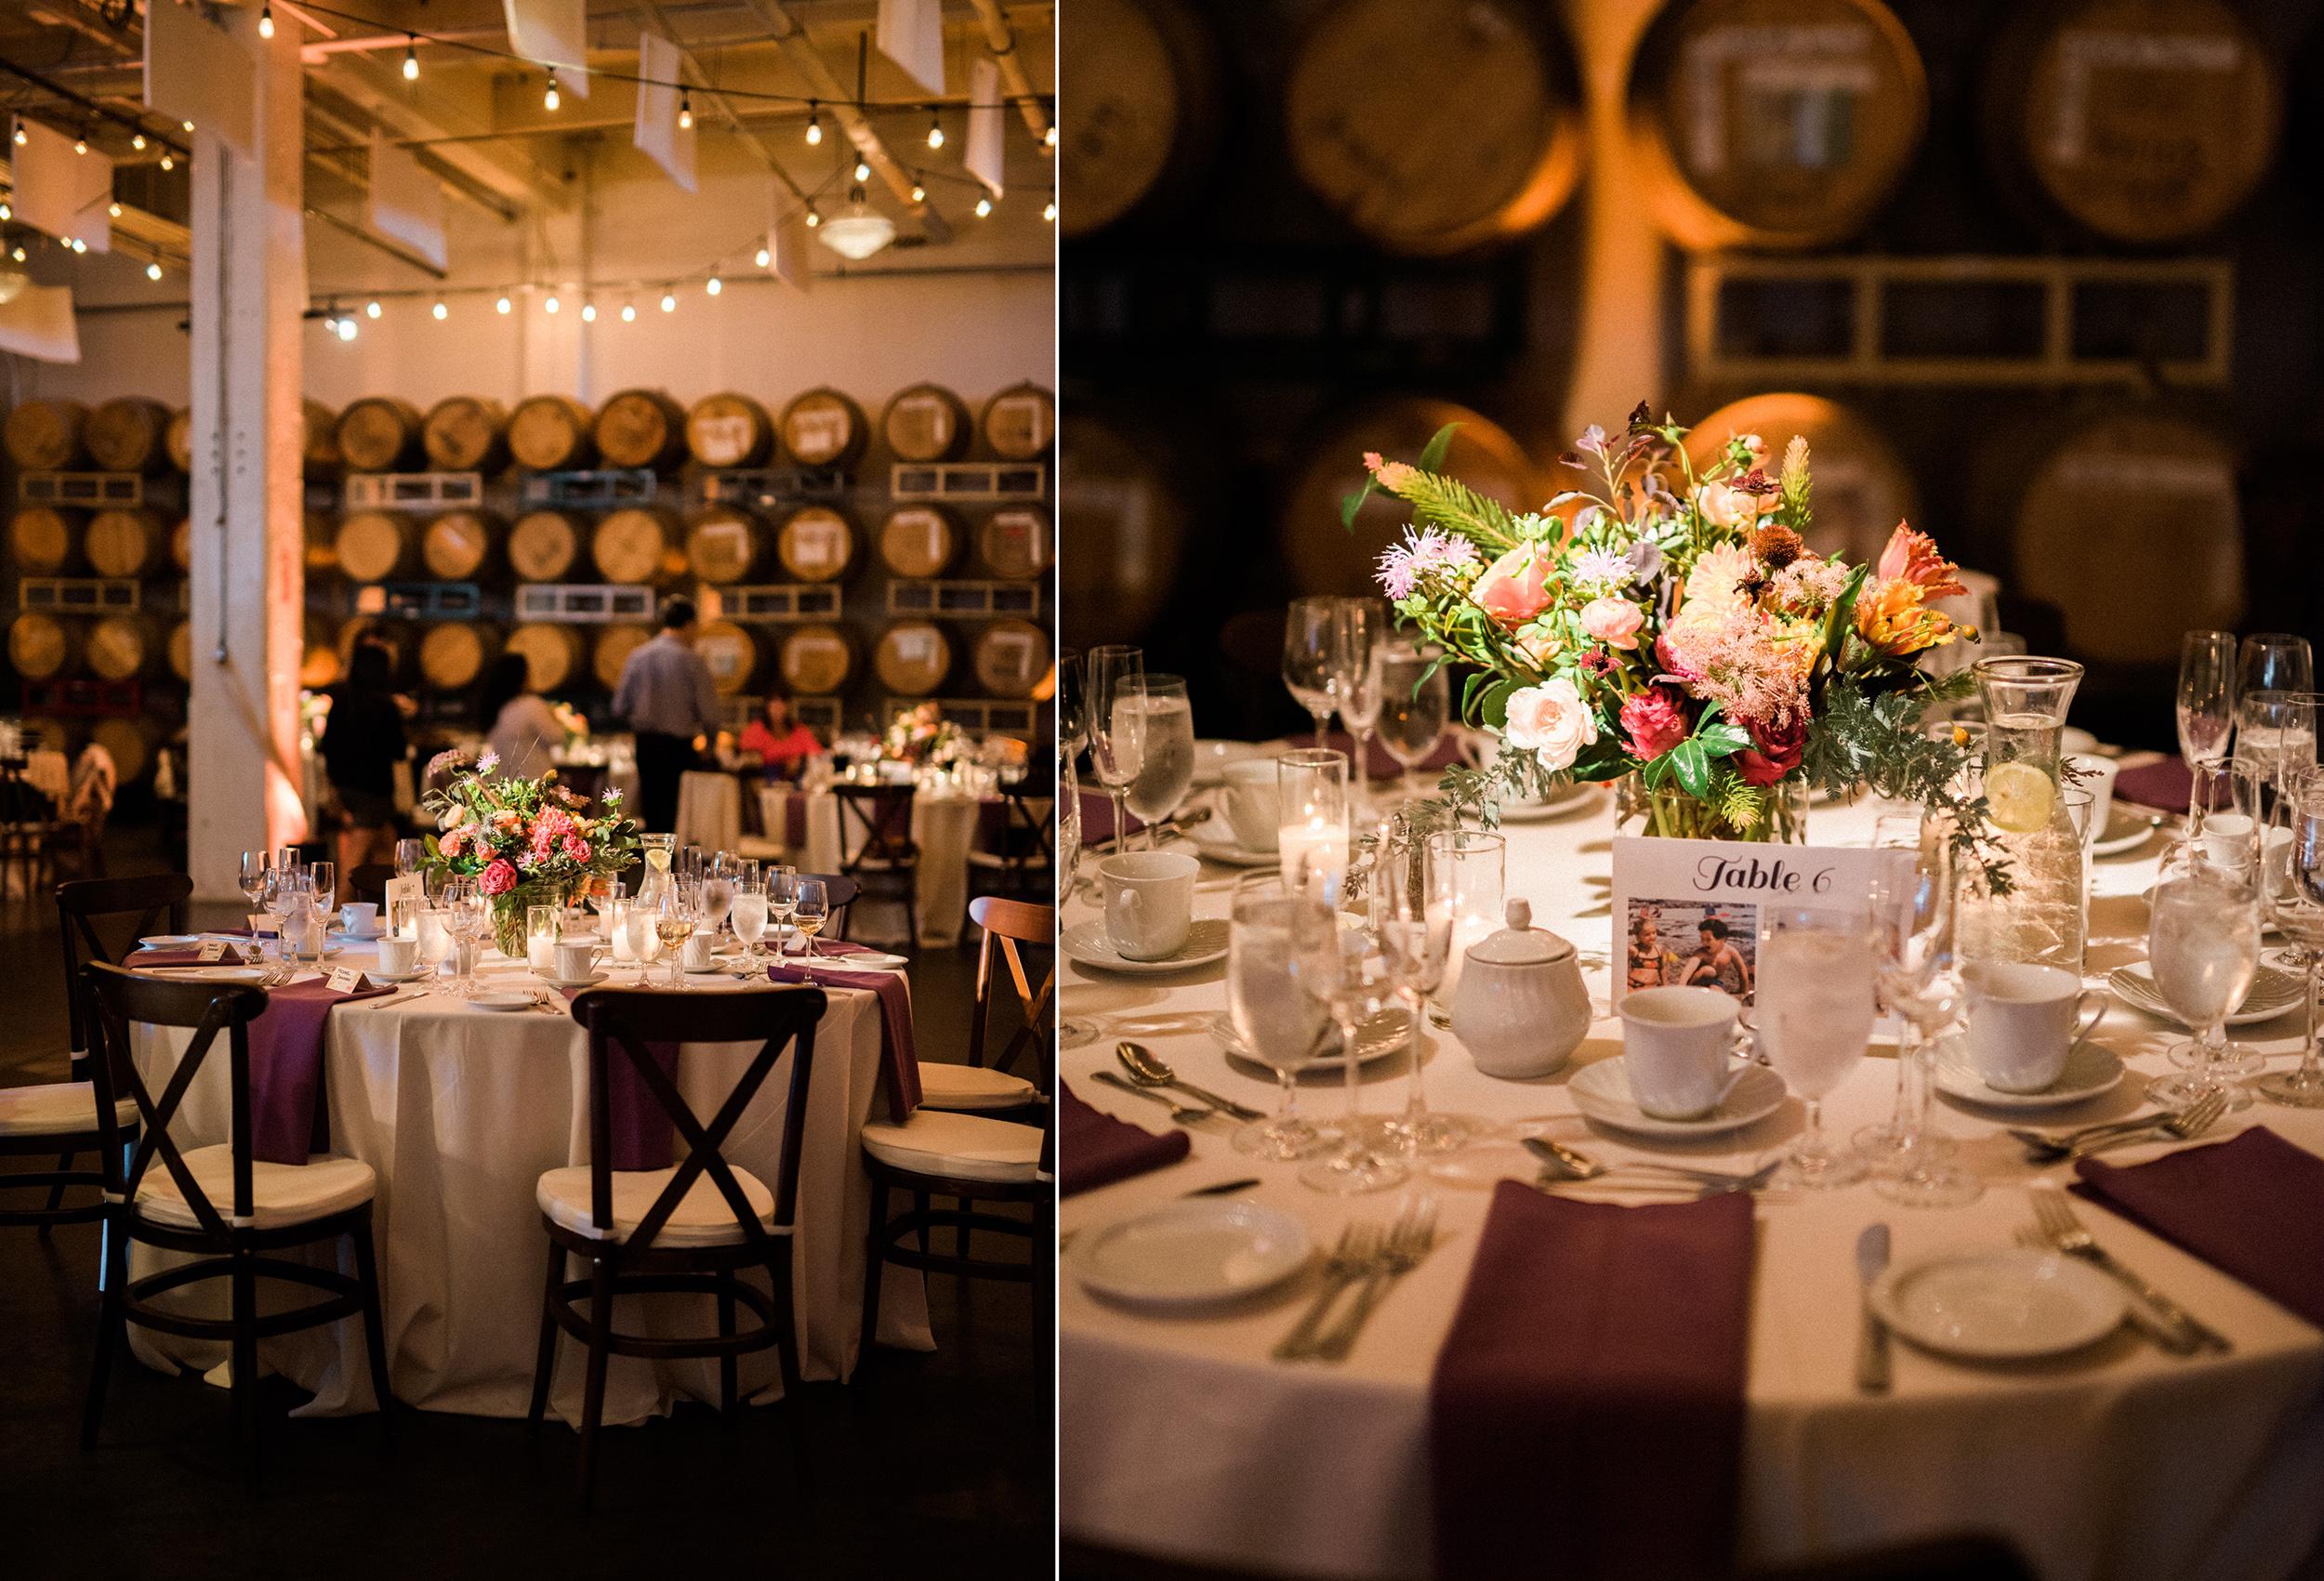 Swedenborgian Church Dogpatch Winery Wedding049.jpg